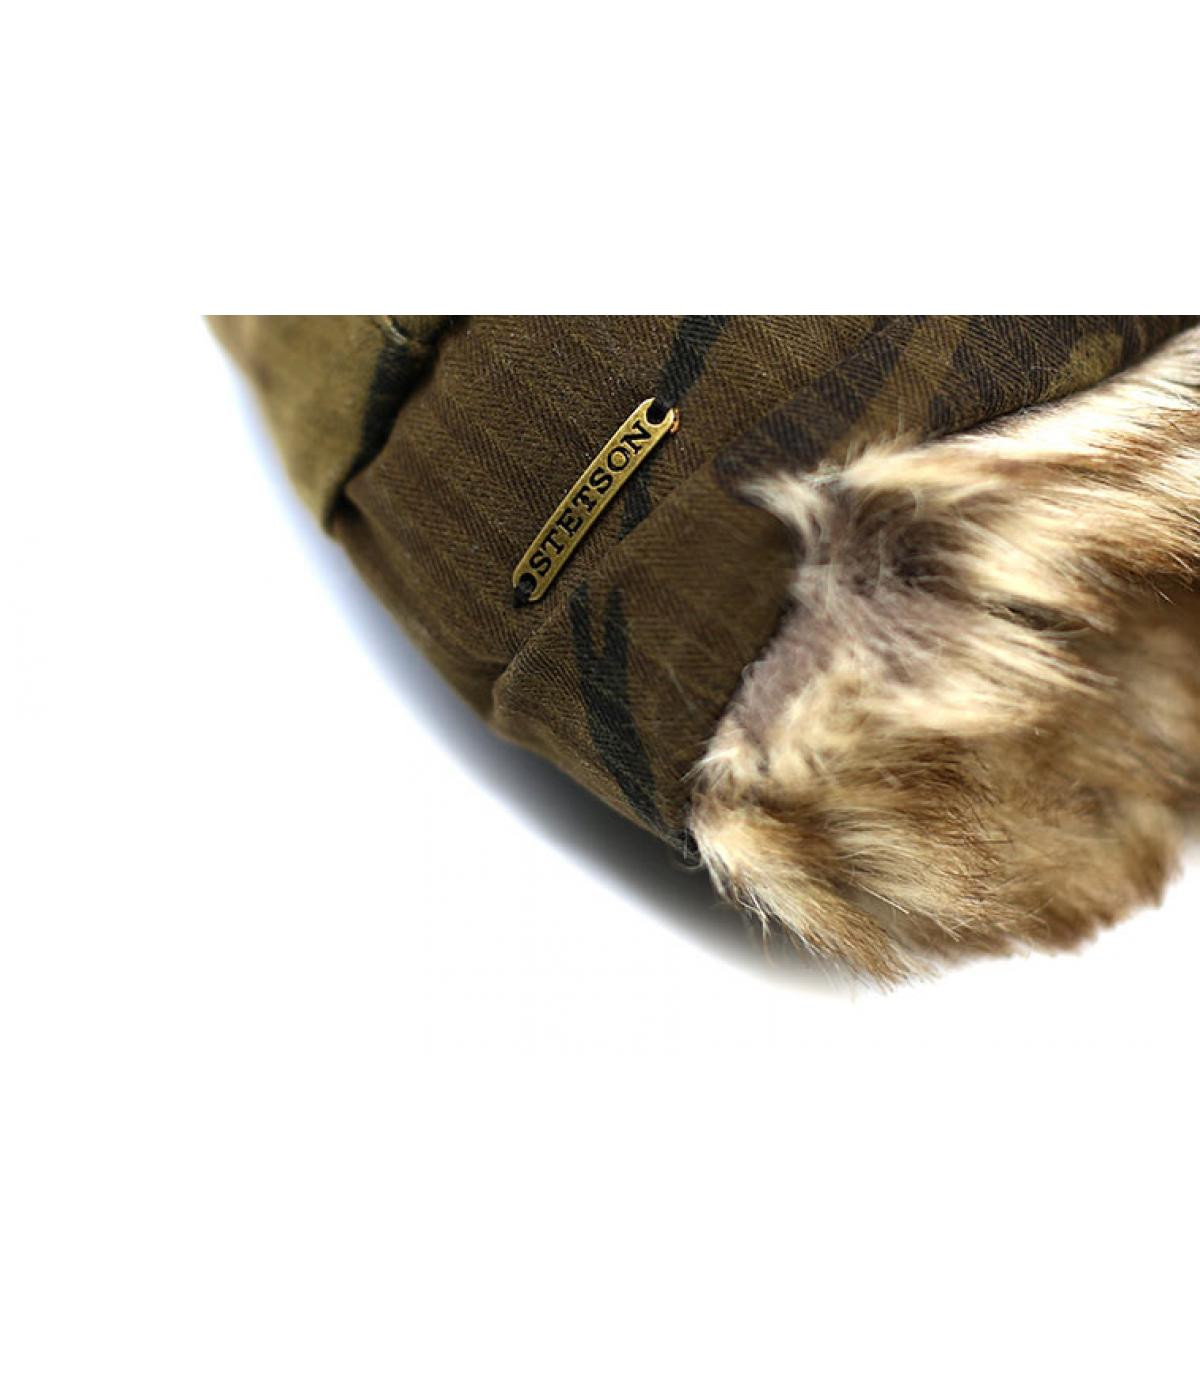 Details Bomber Cap Waxed Cotton Camouflage - Abbildung 3